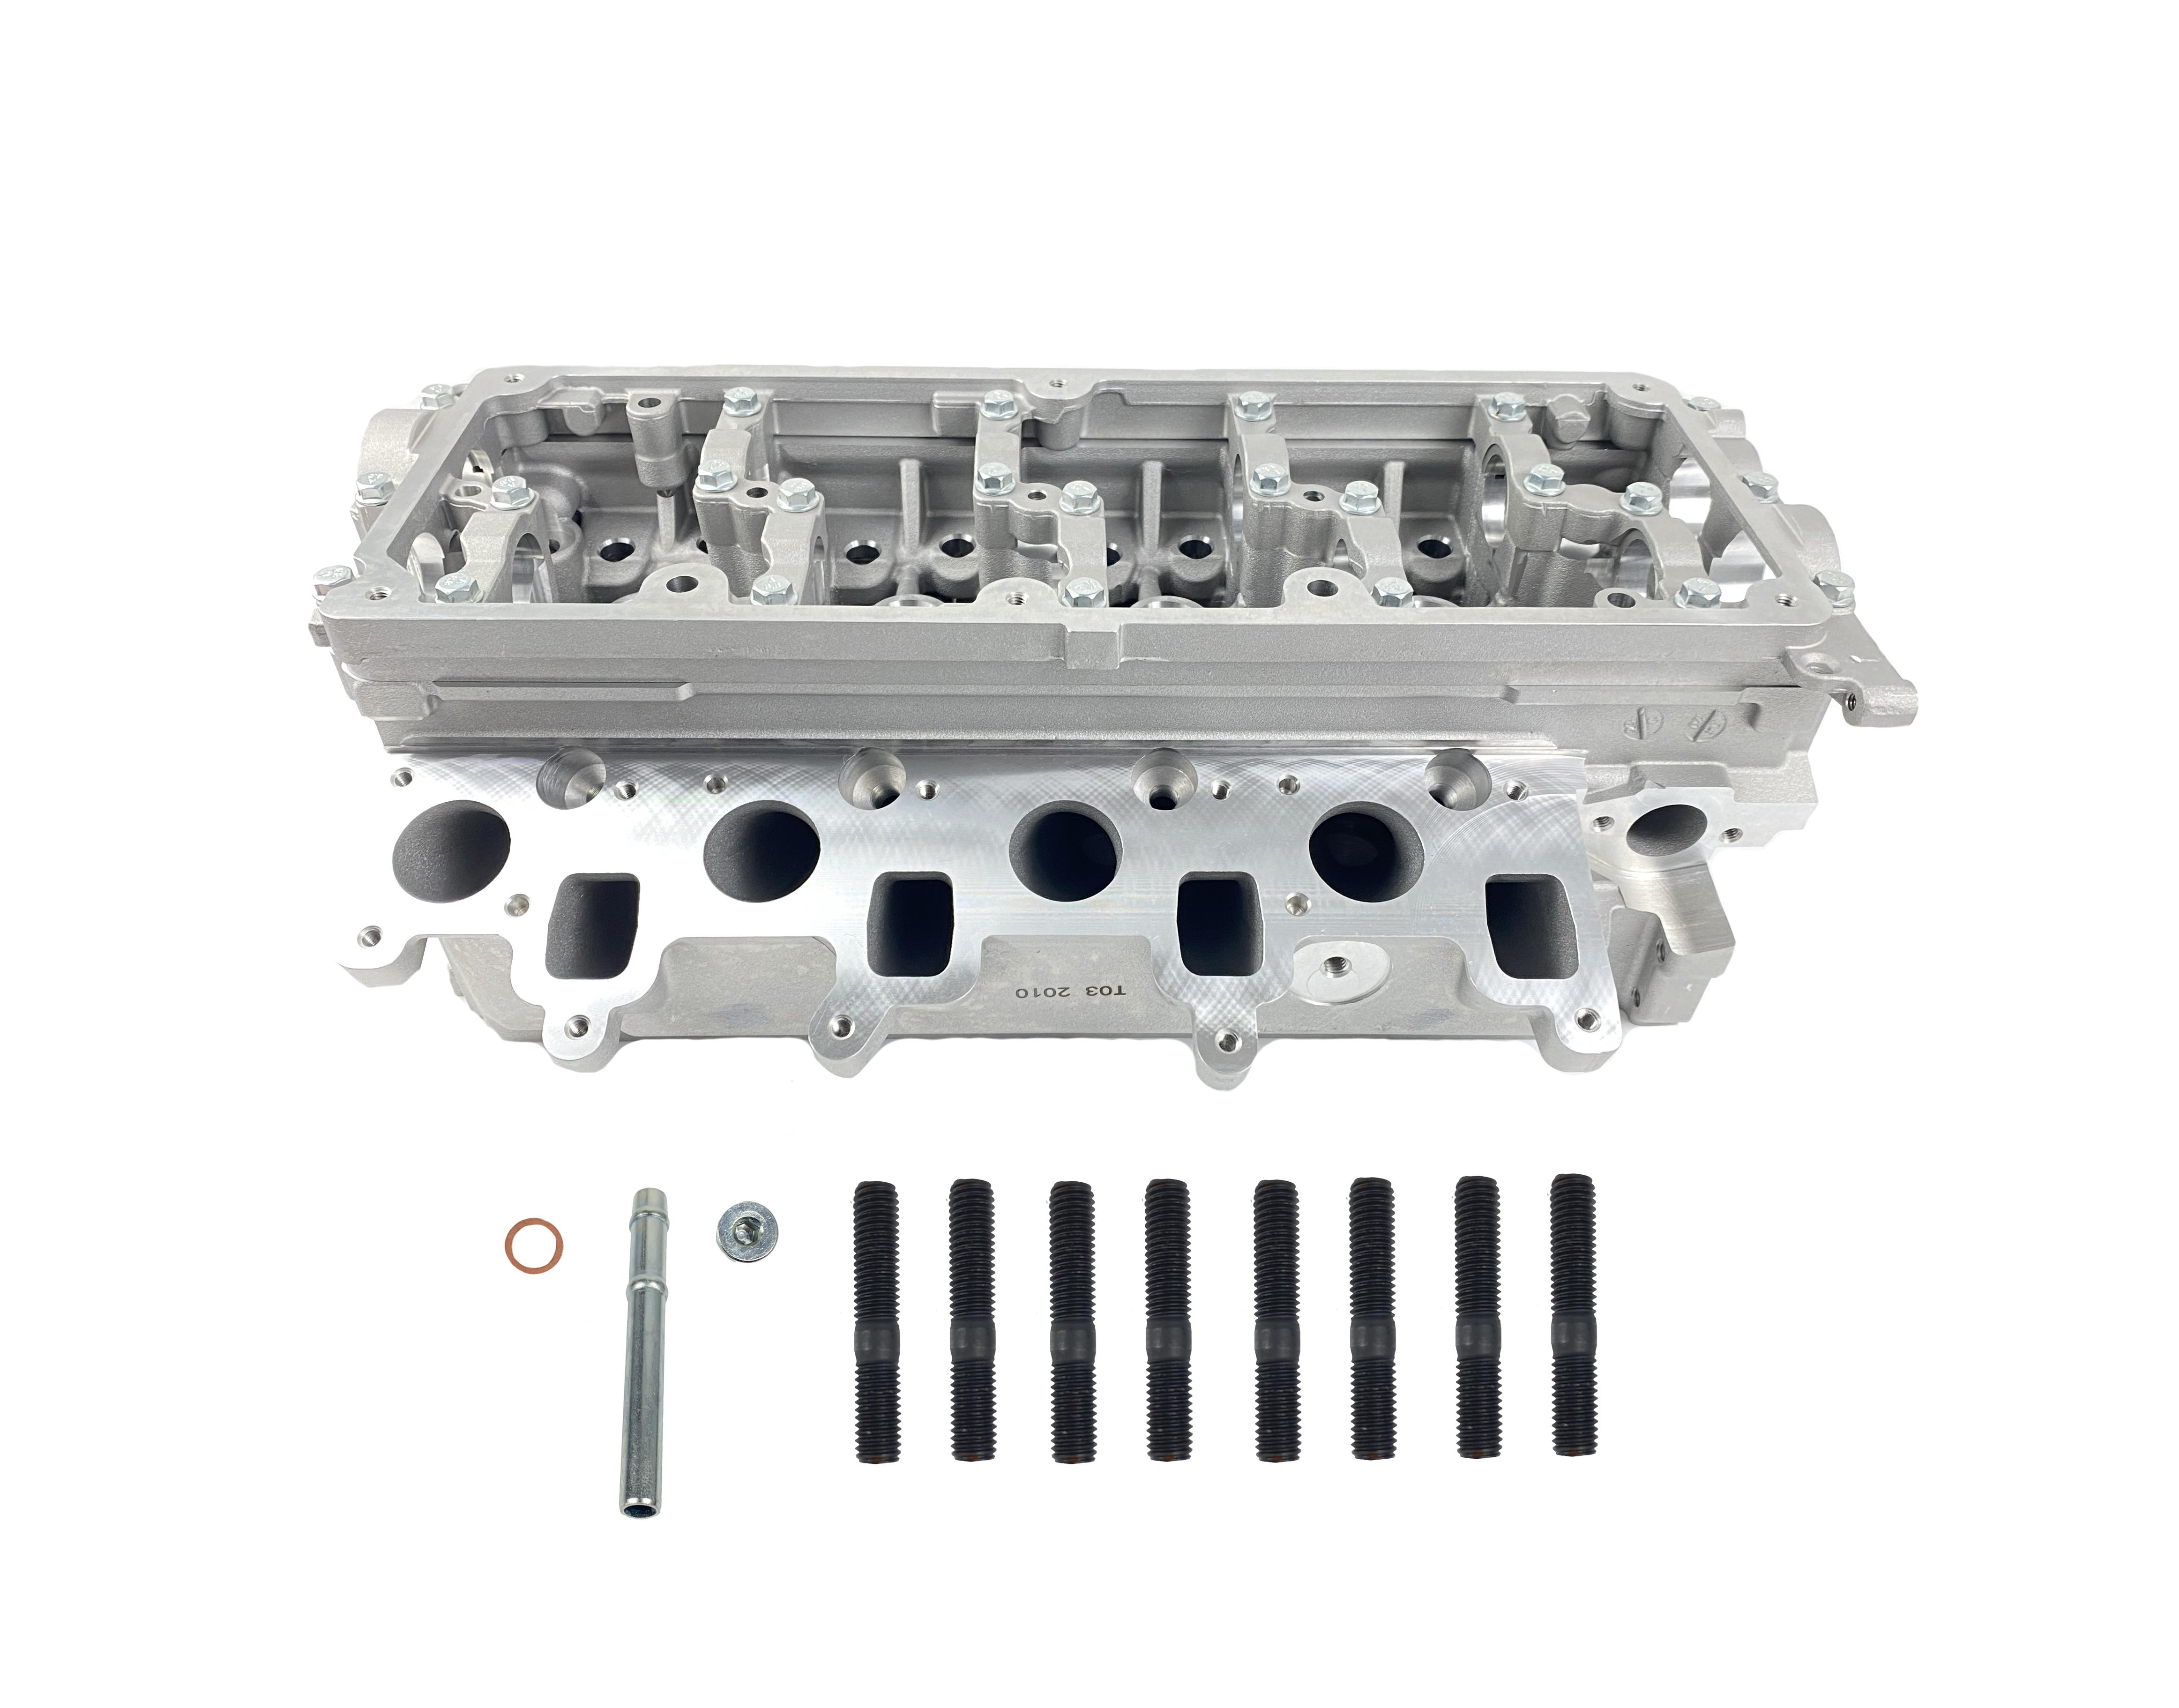 Zylinderkopf für VW Transporter T5 T6 Multivan 2,0 TDI BiTDI CFC CFCA 908727 NEU